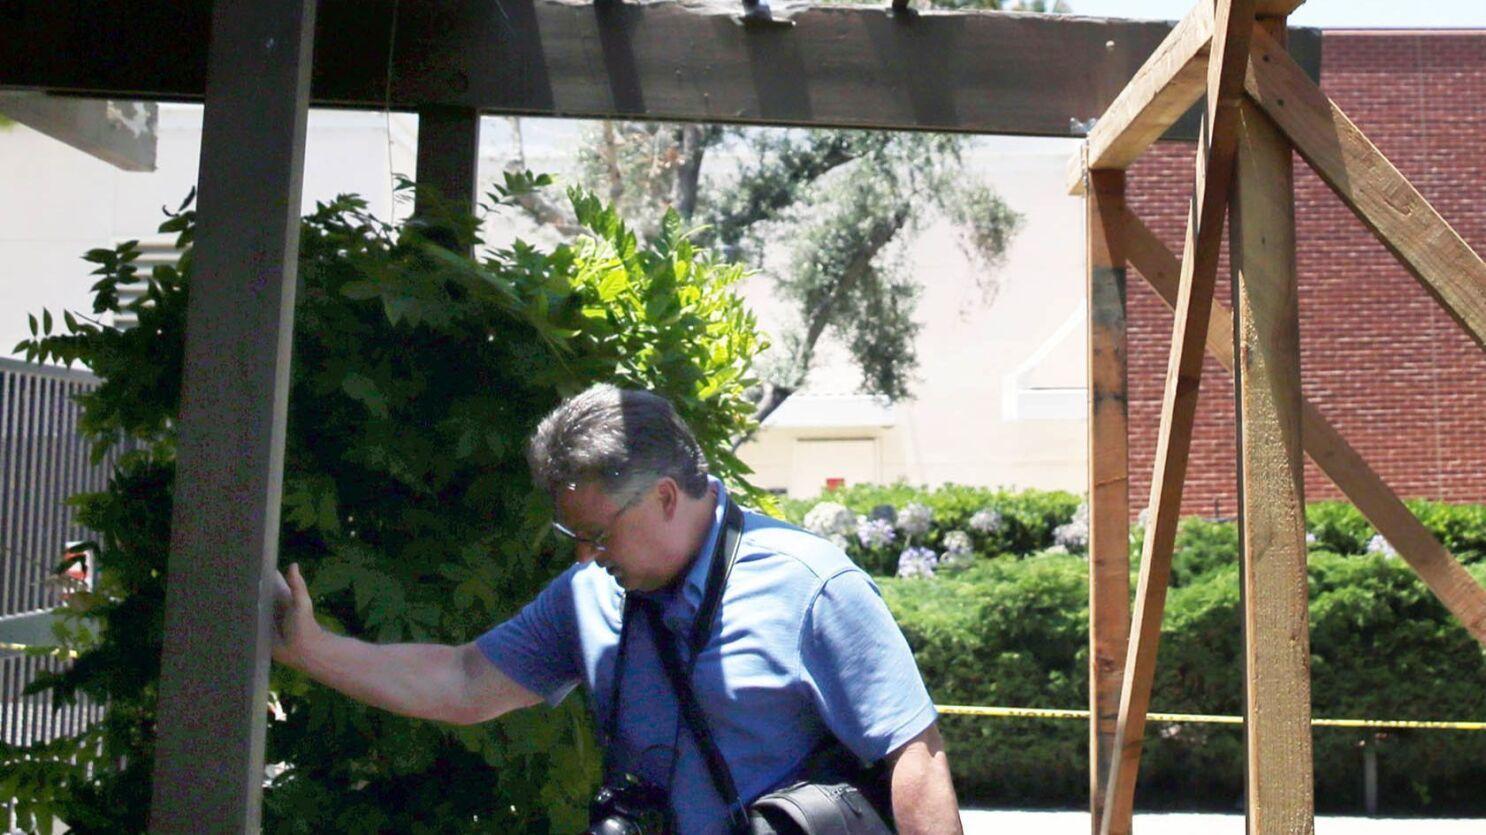 California housing crisis podcast: When a big earthquake hits Los Angeles or San Francisco